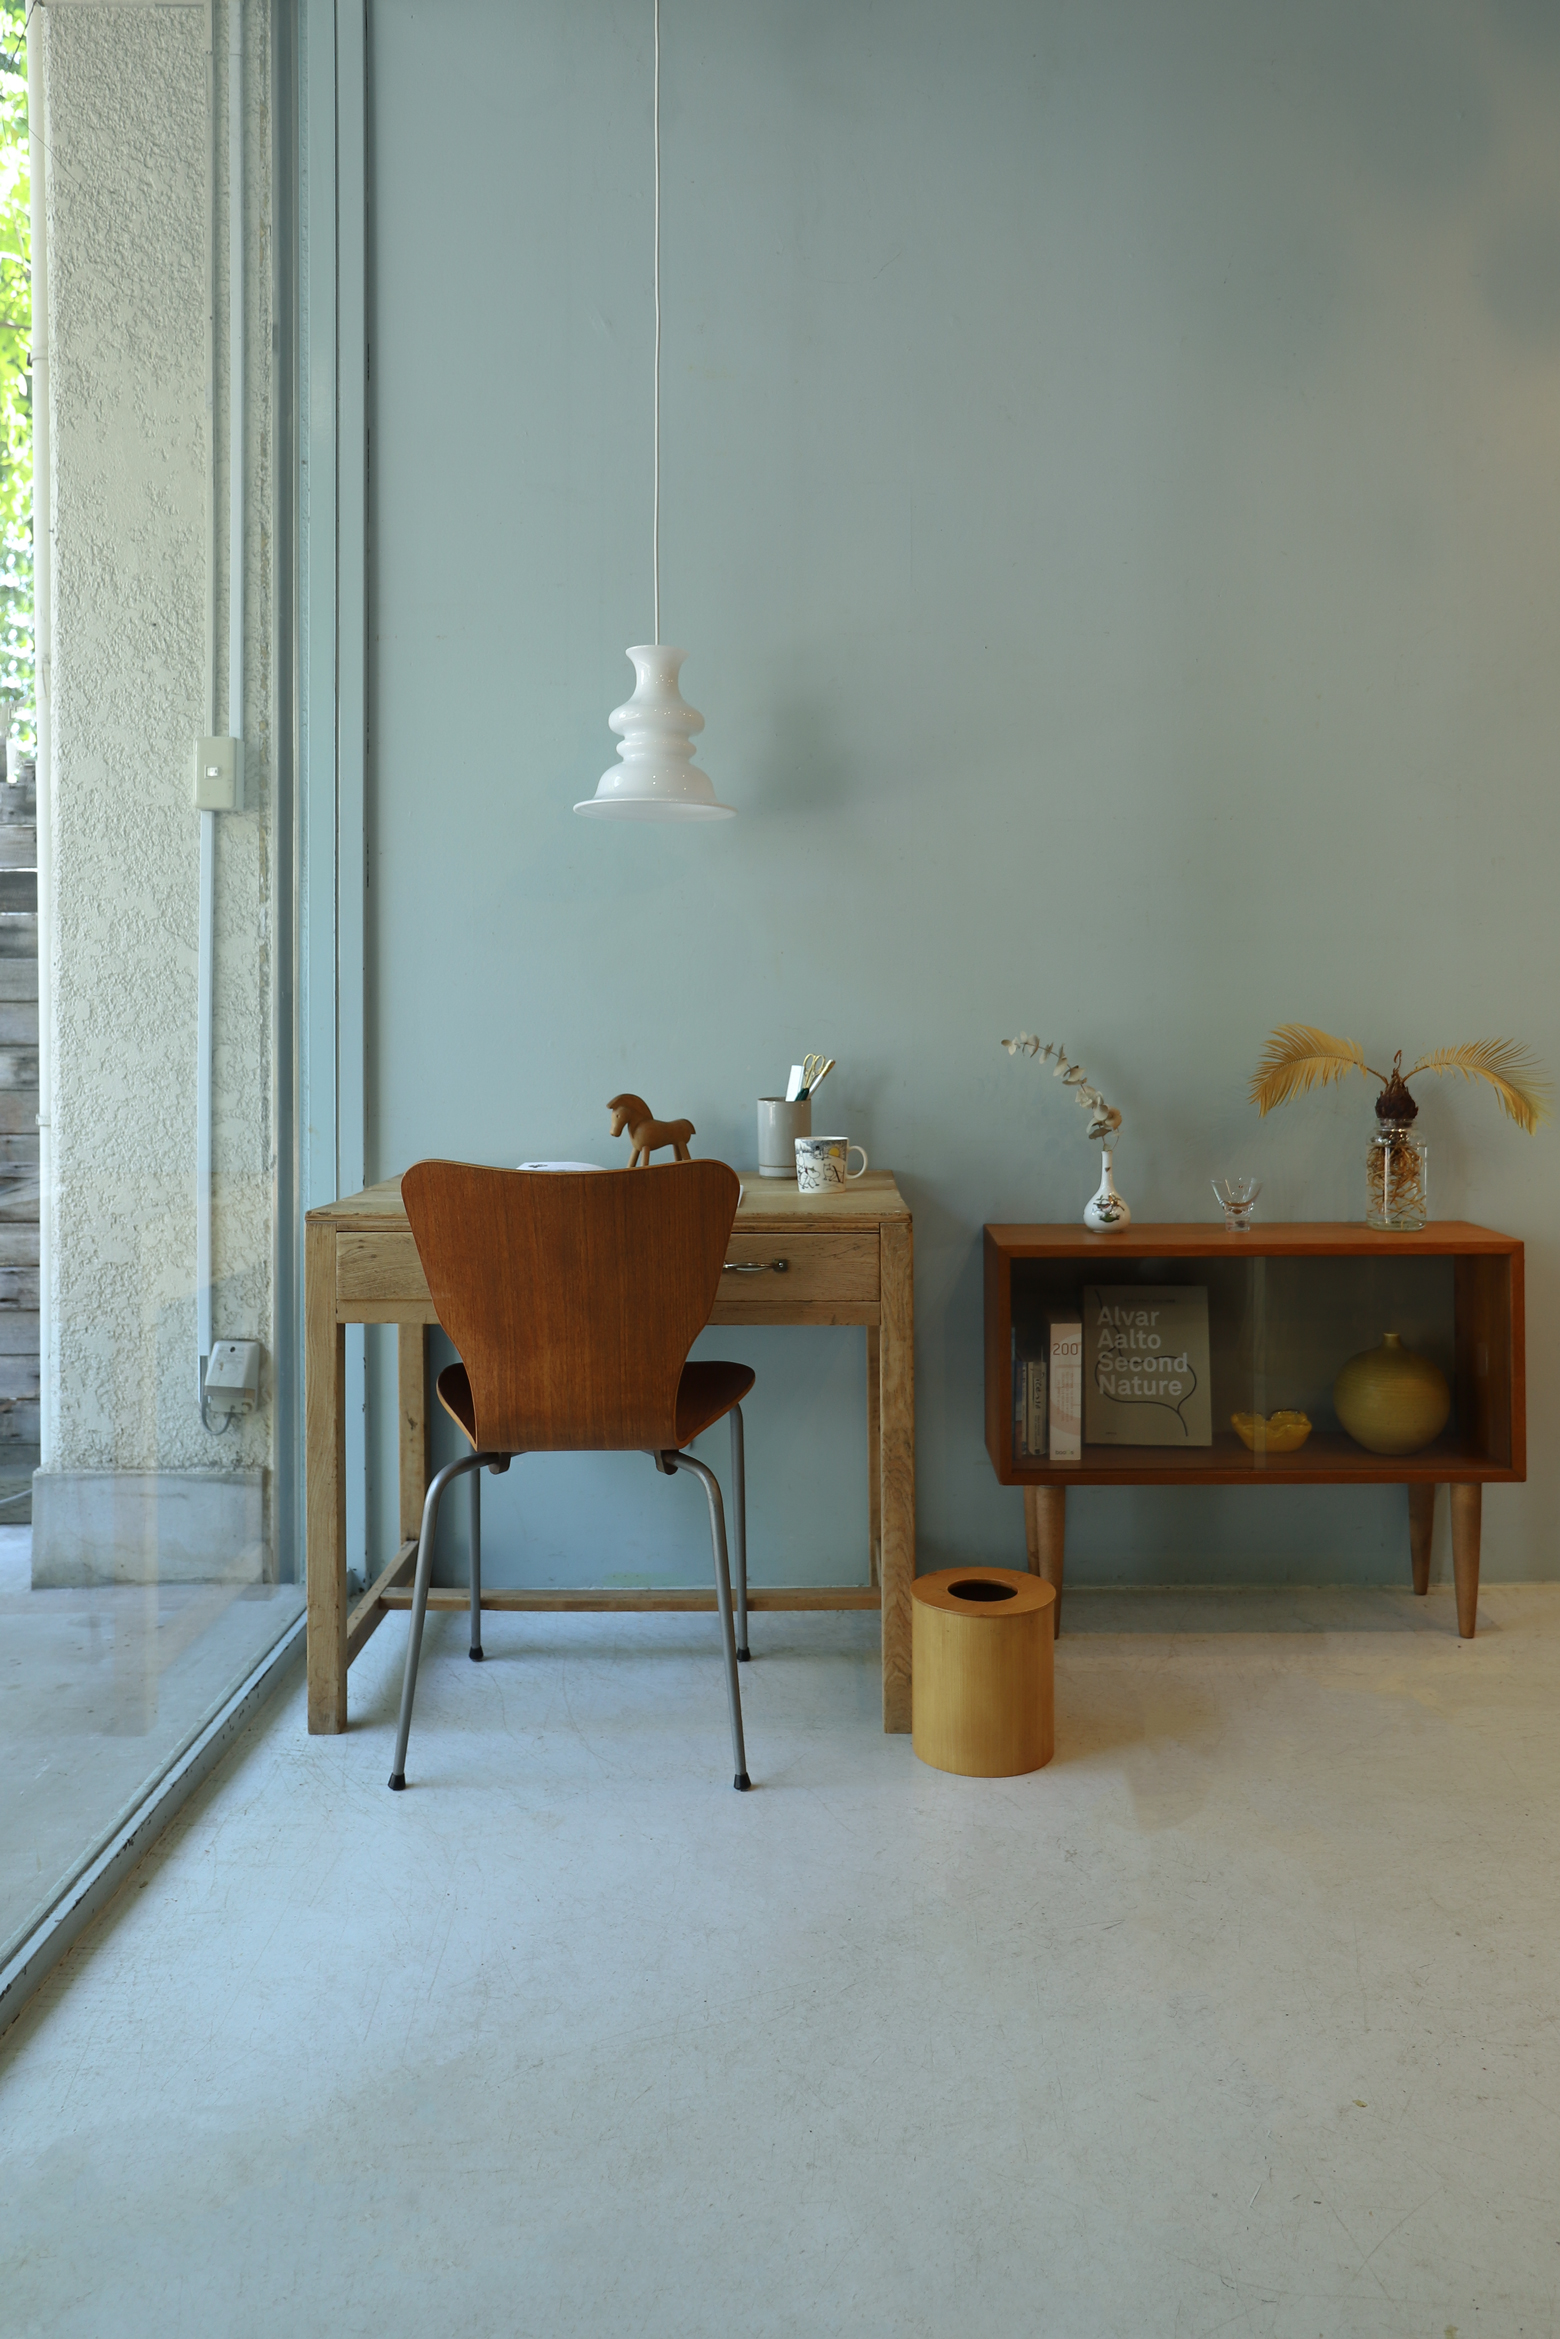 "Holmegaard Pendant Light ""Bibliotek"" Sidse Werner/ホルムガード ペンダントライト シセ・ヴェアナー ガラス 照明 デンマーク 北欧デザイン"